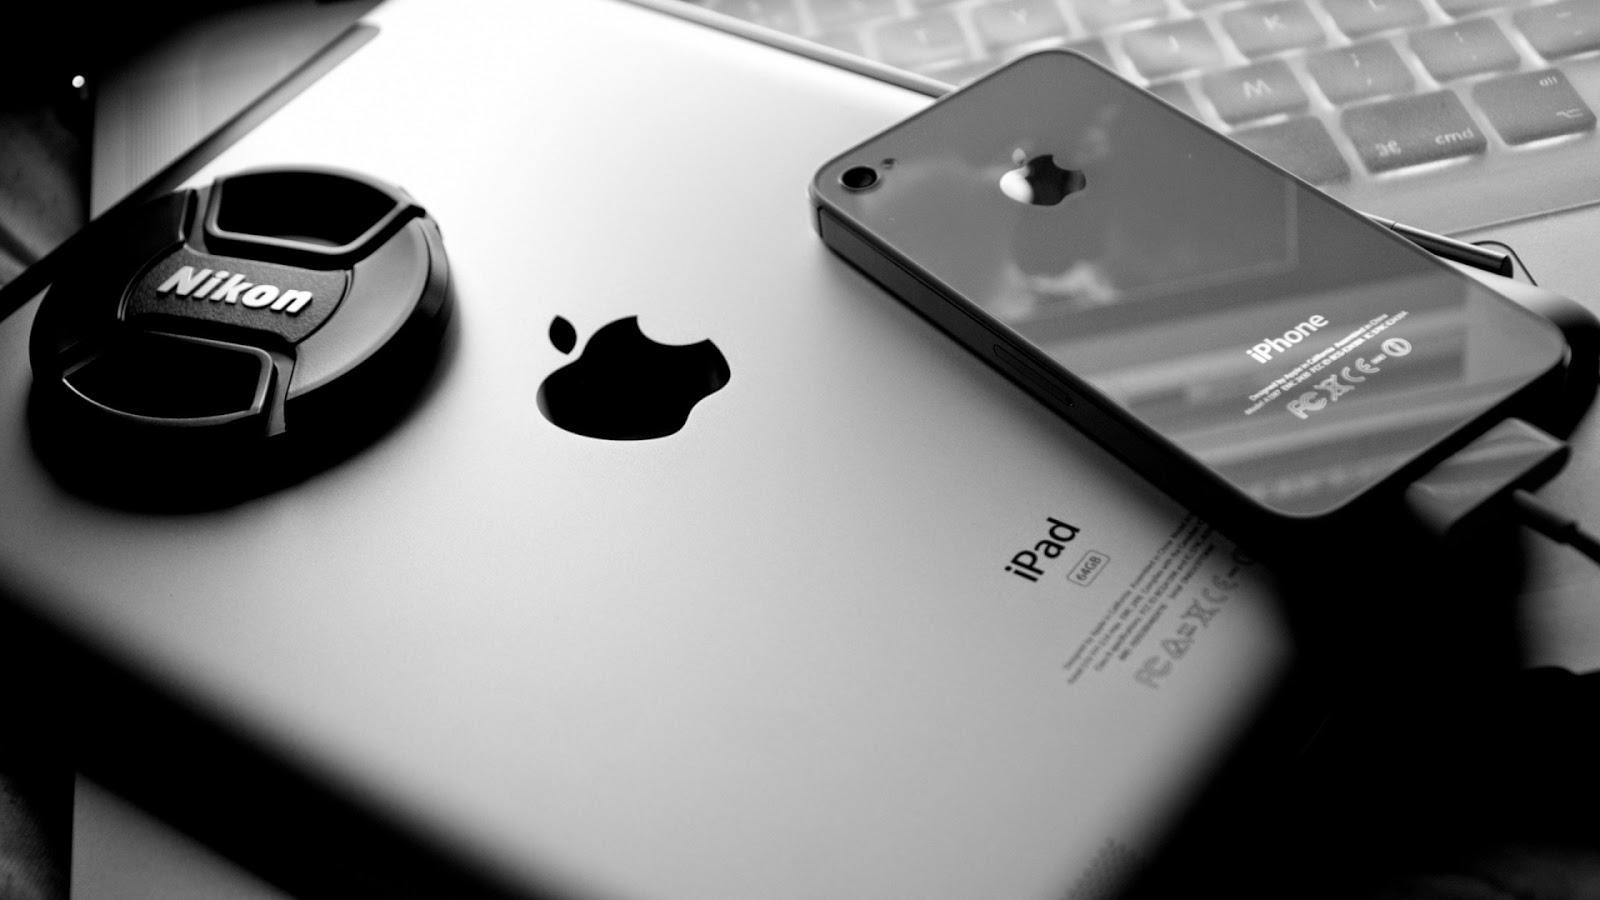 Nikon Iphone Ipad Electronics